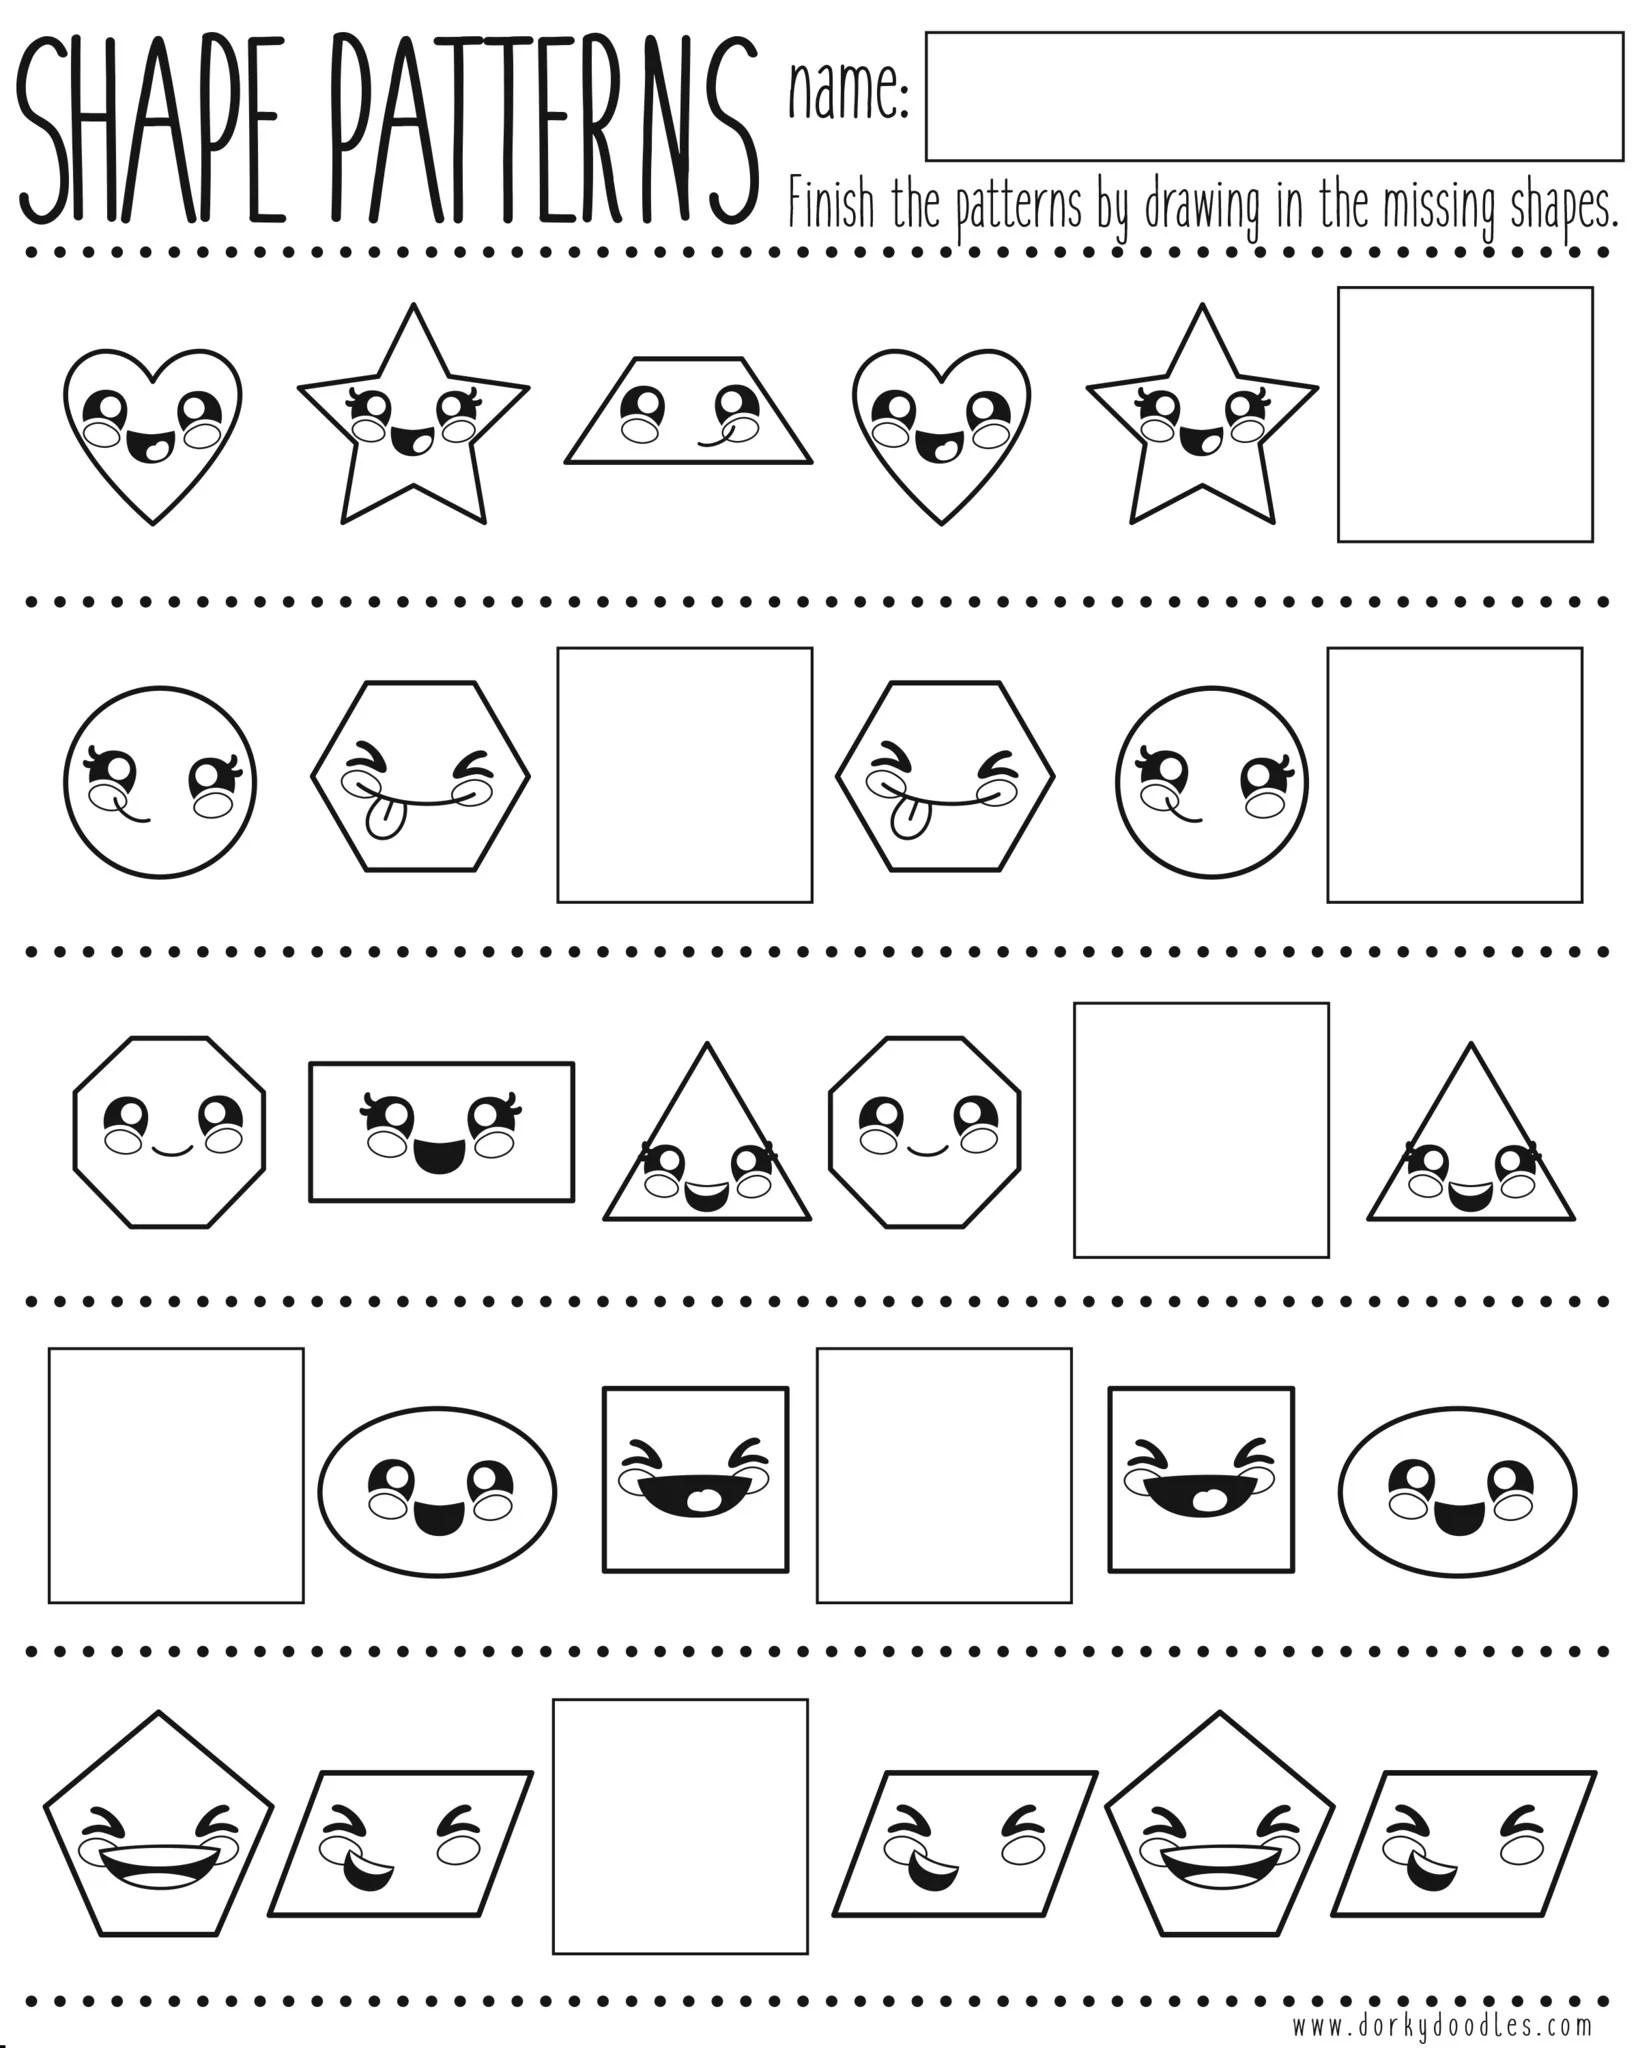 medium resolution of Shapes and Pattern Practice Printable Worksheet – Dorky Doodles